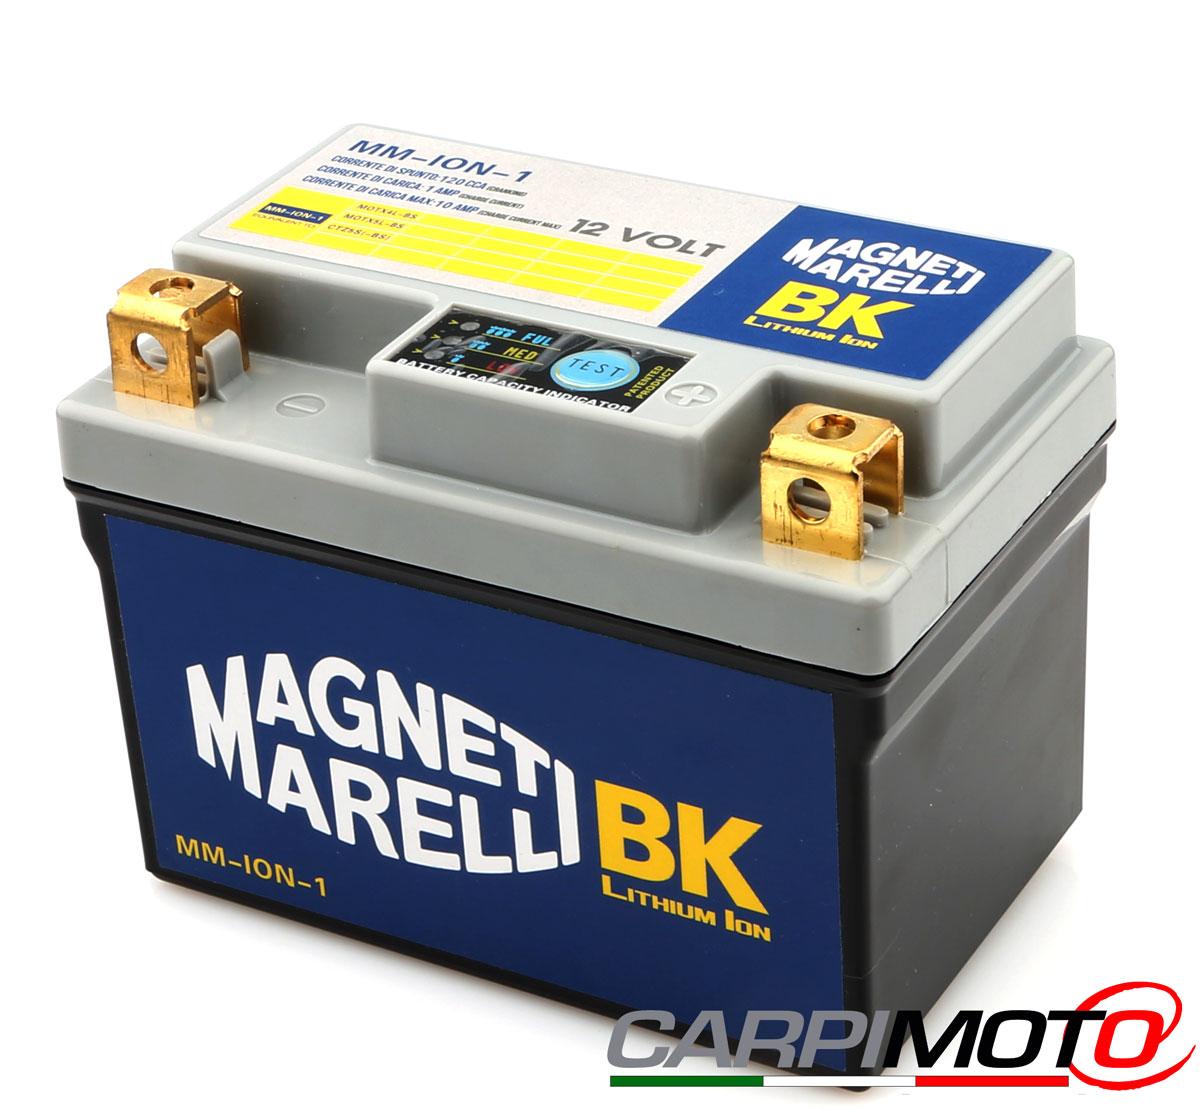 magneti marelli lithium battery mmyx5l. Black Bedroom Furniture Sets. Home Design Ideas